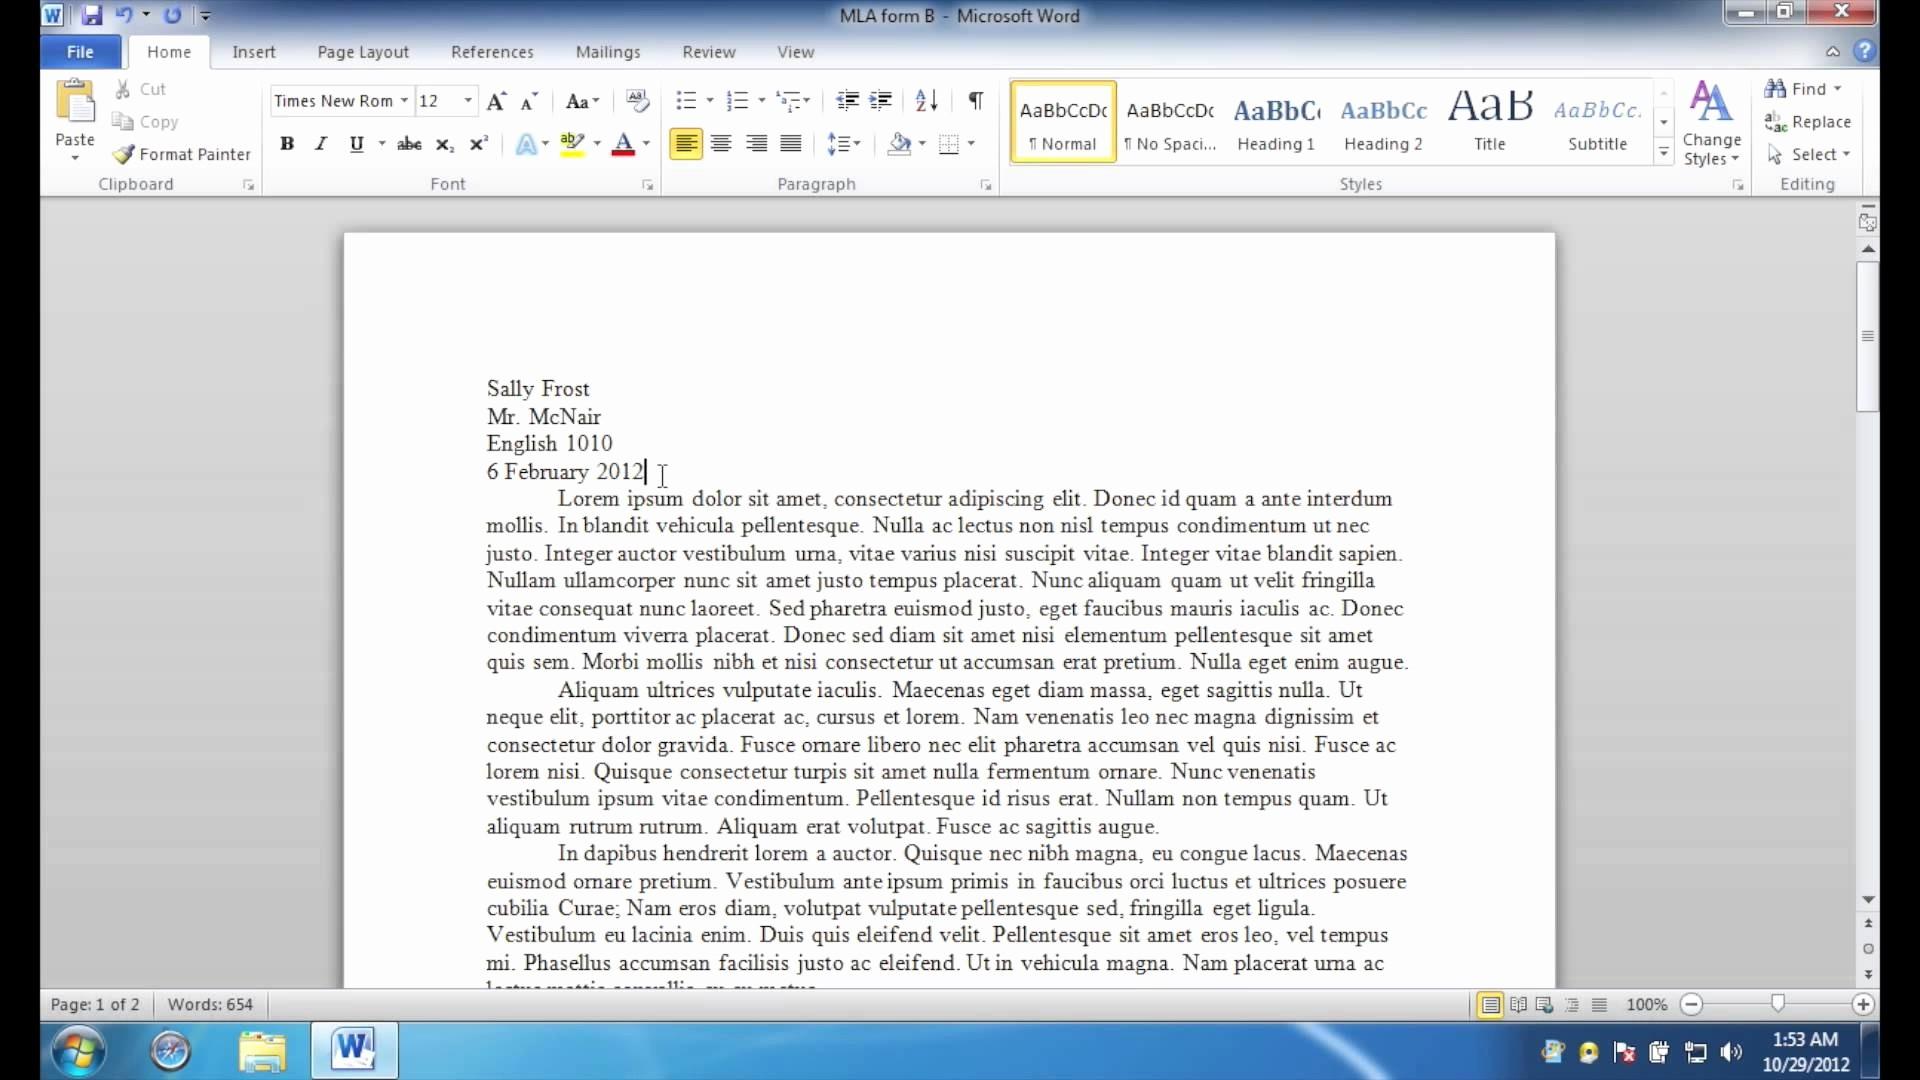 Mla format Word 2010 Template Best Of Best S Of Mla Outline format 2010 Mla format Sample